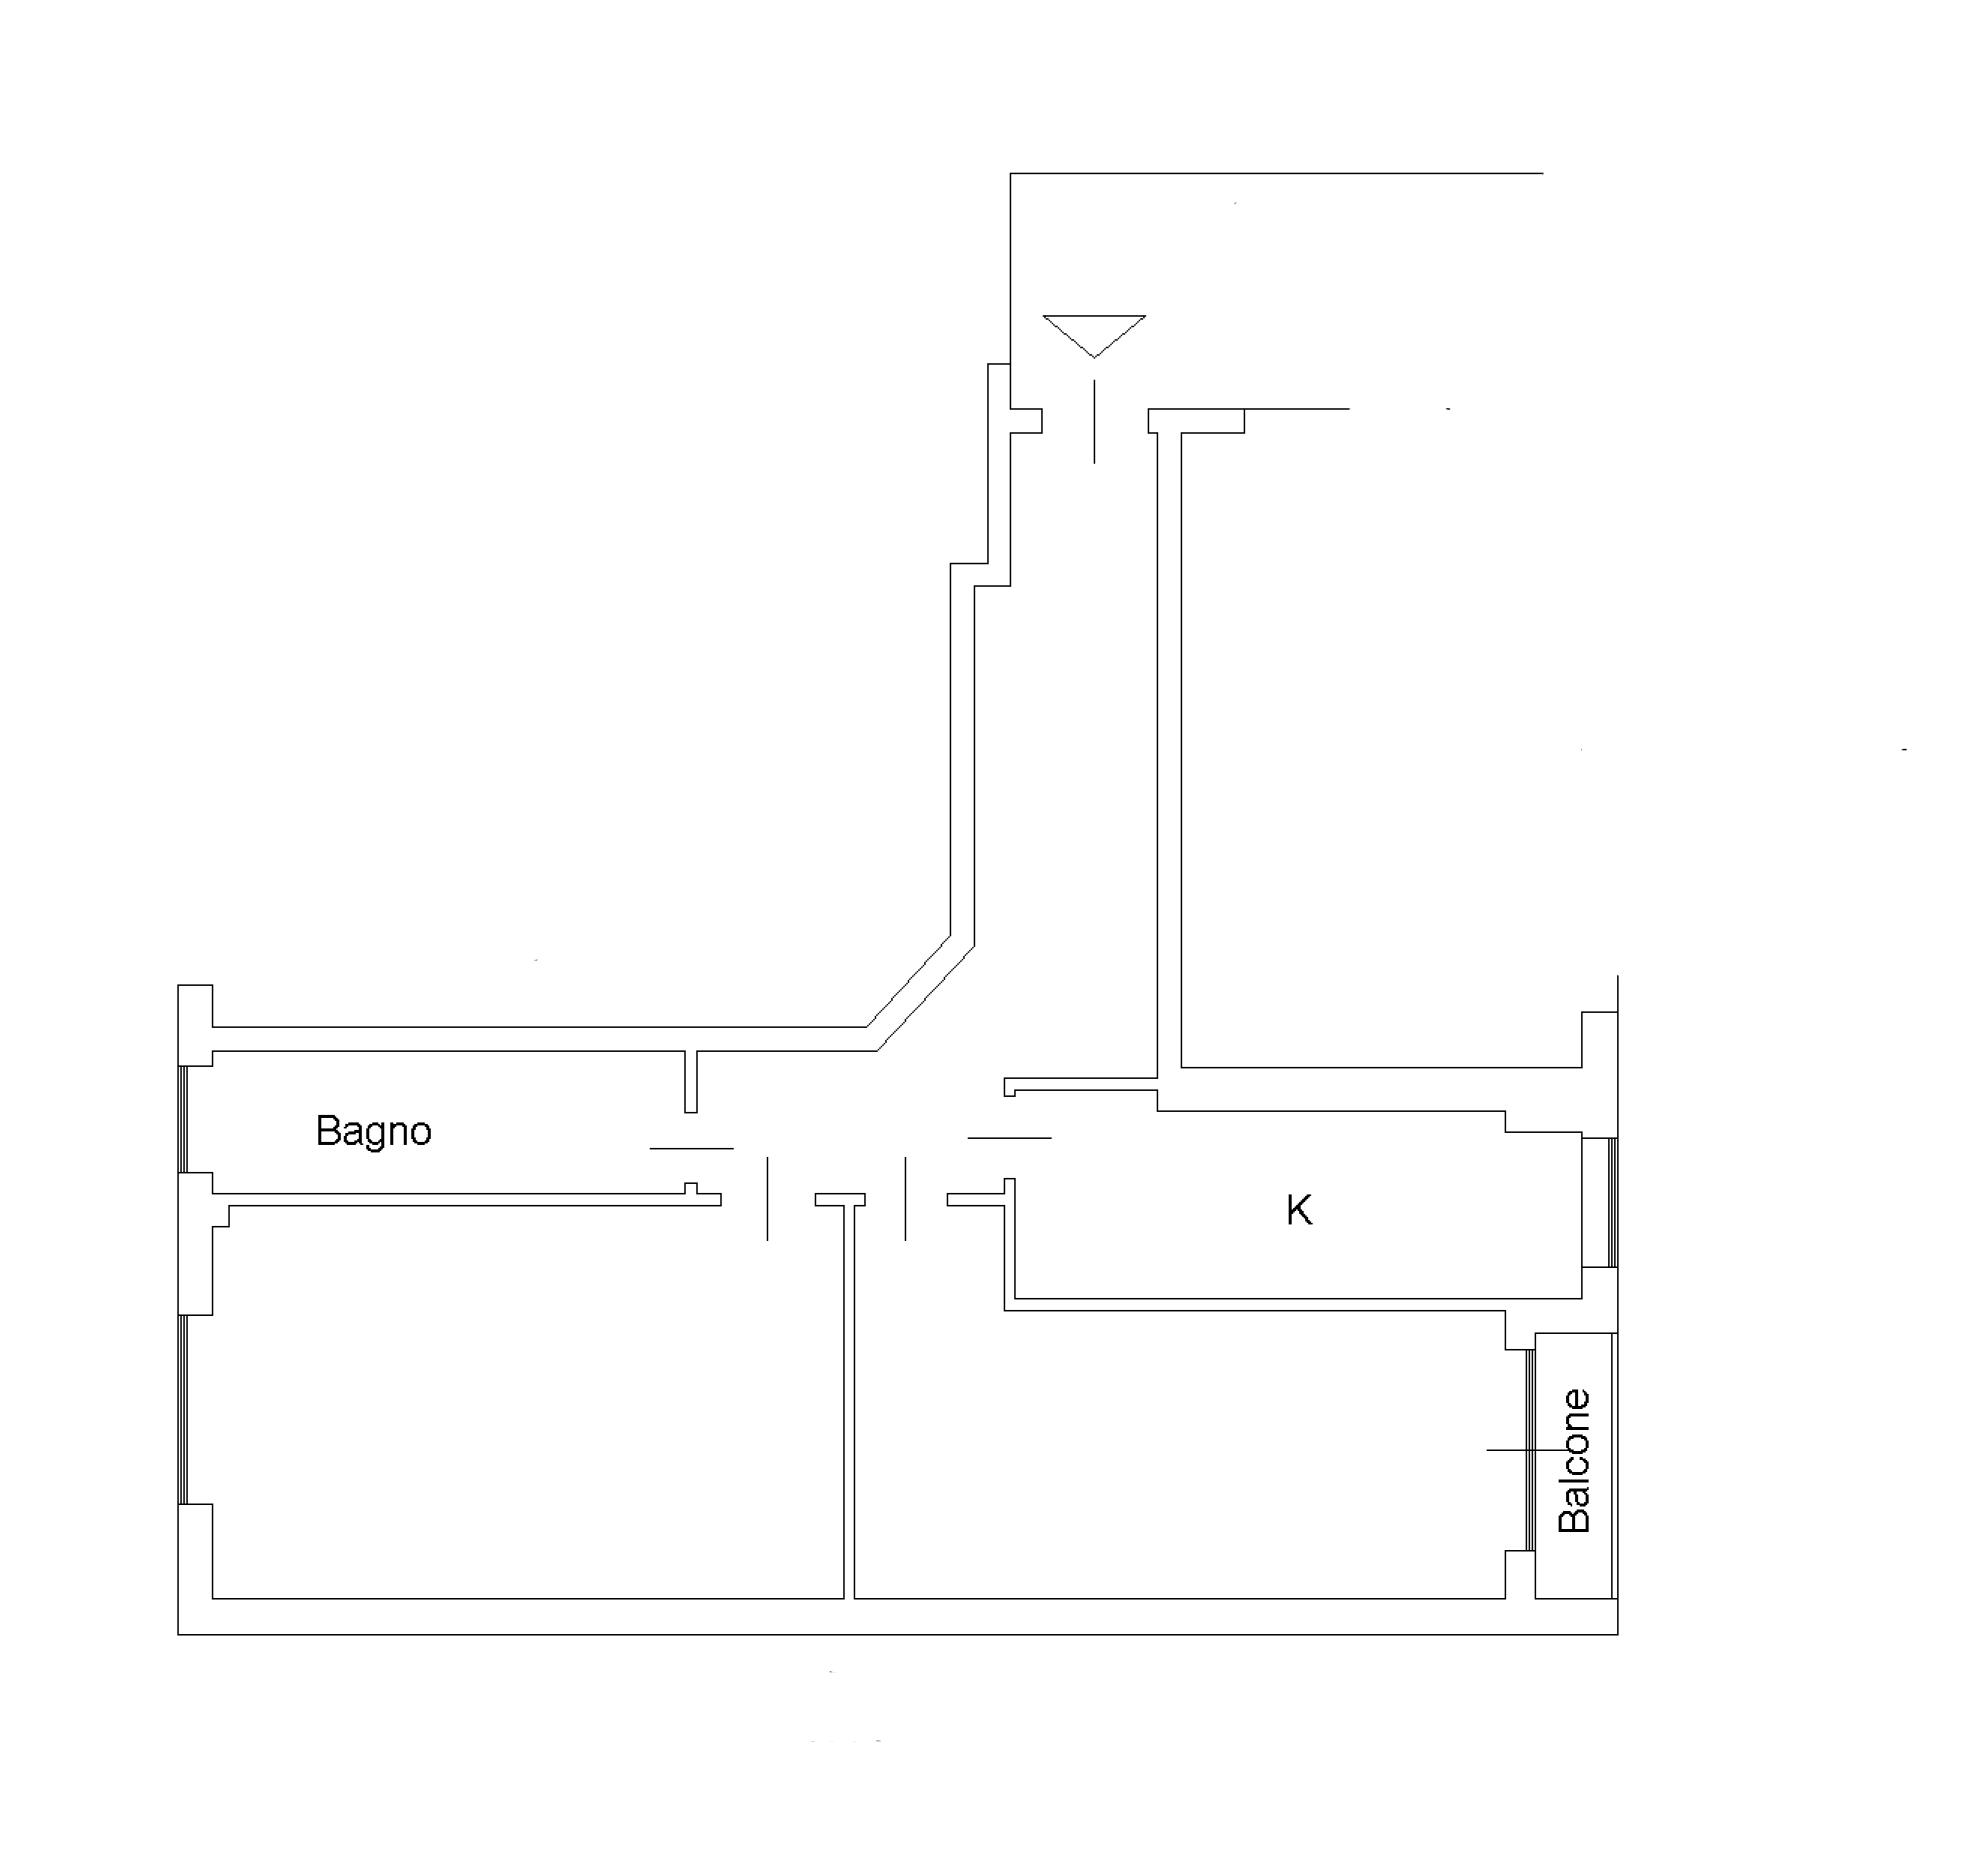 planimetrie/HirxaMbeDu.jpg